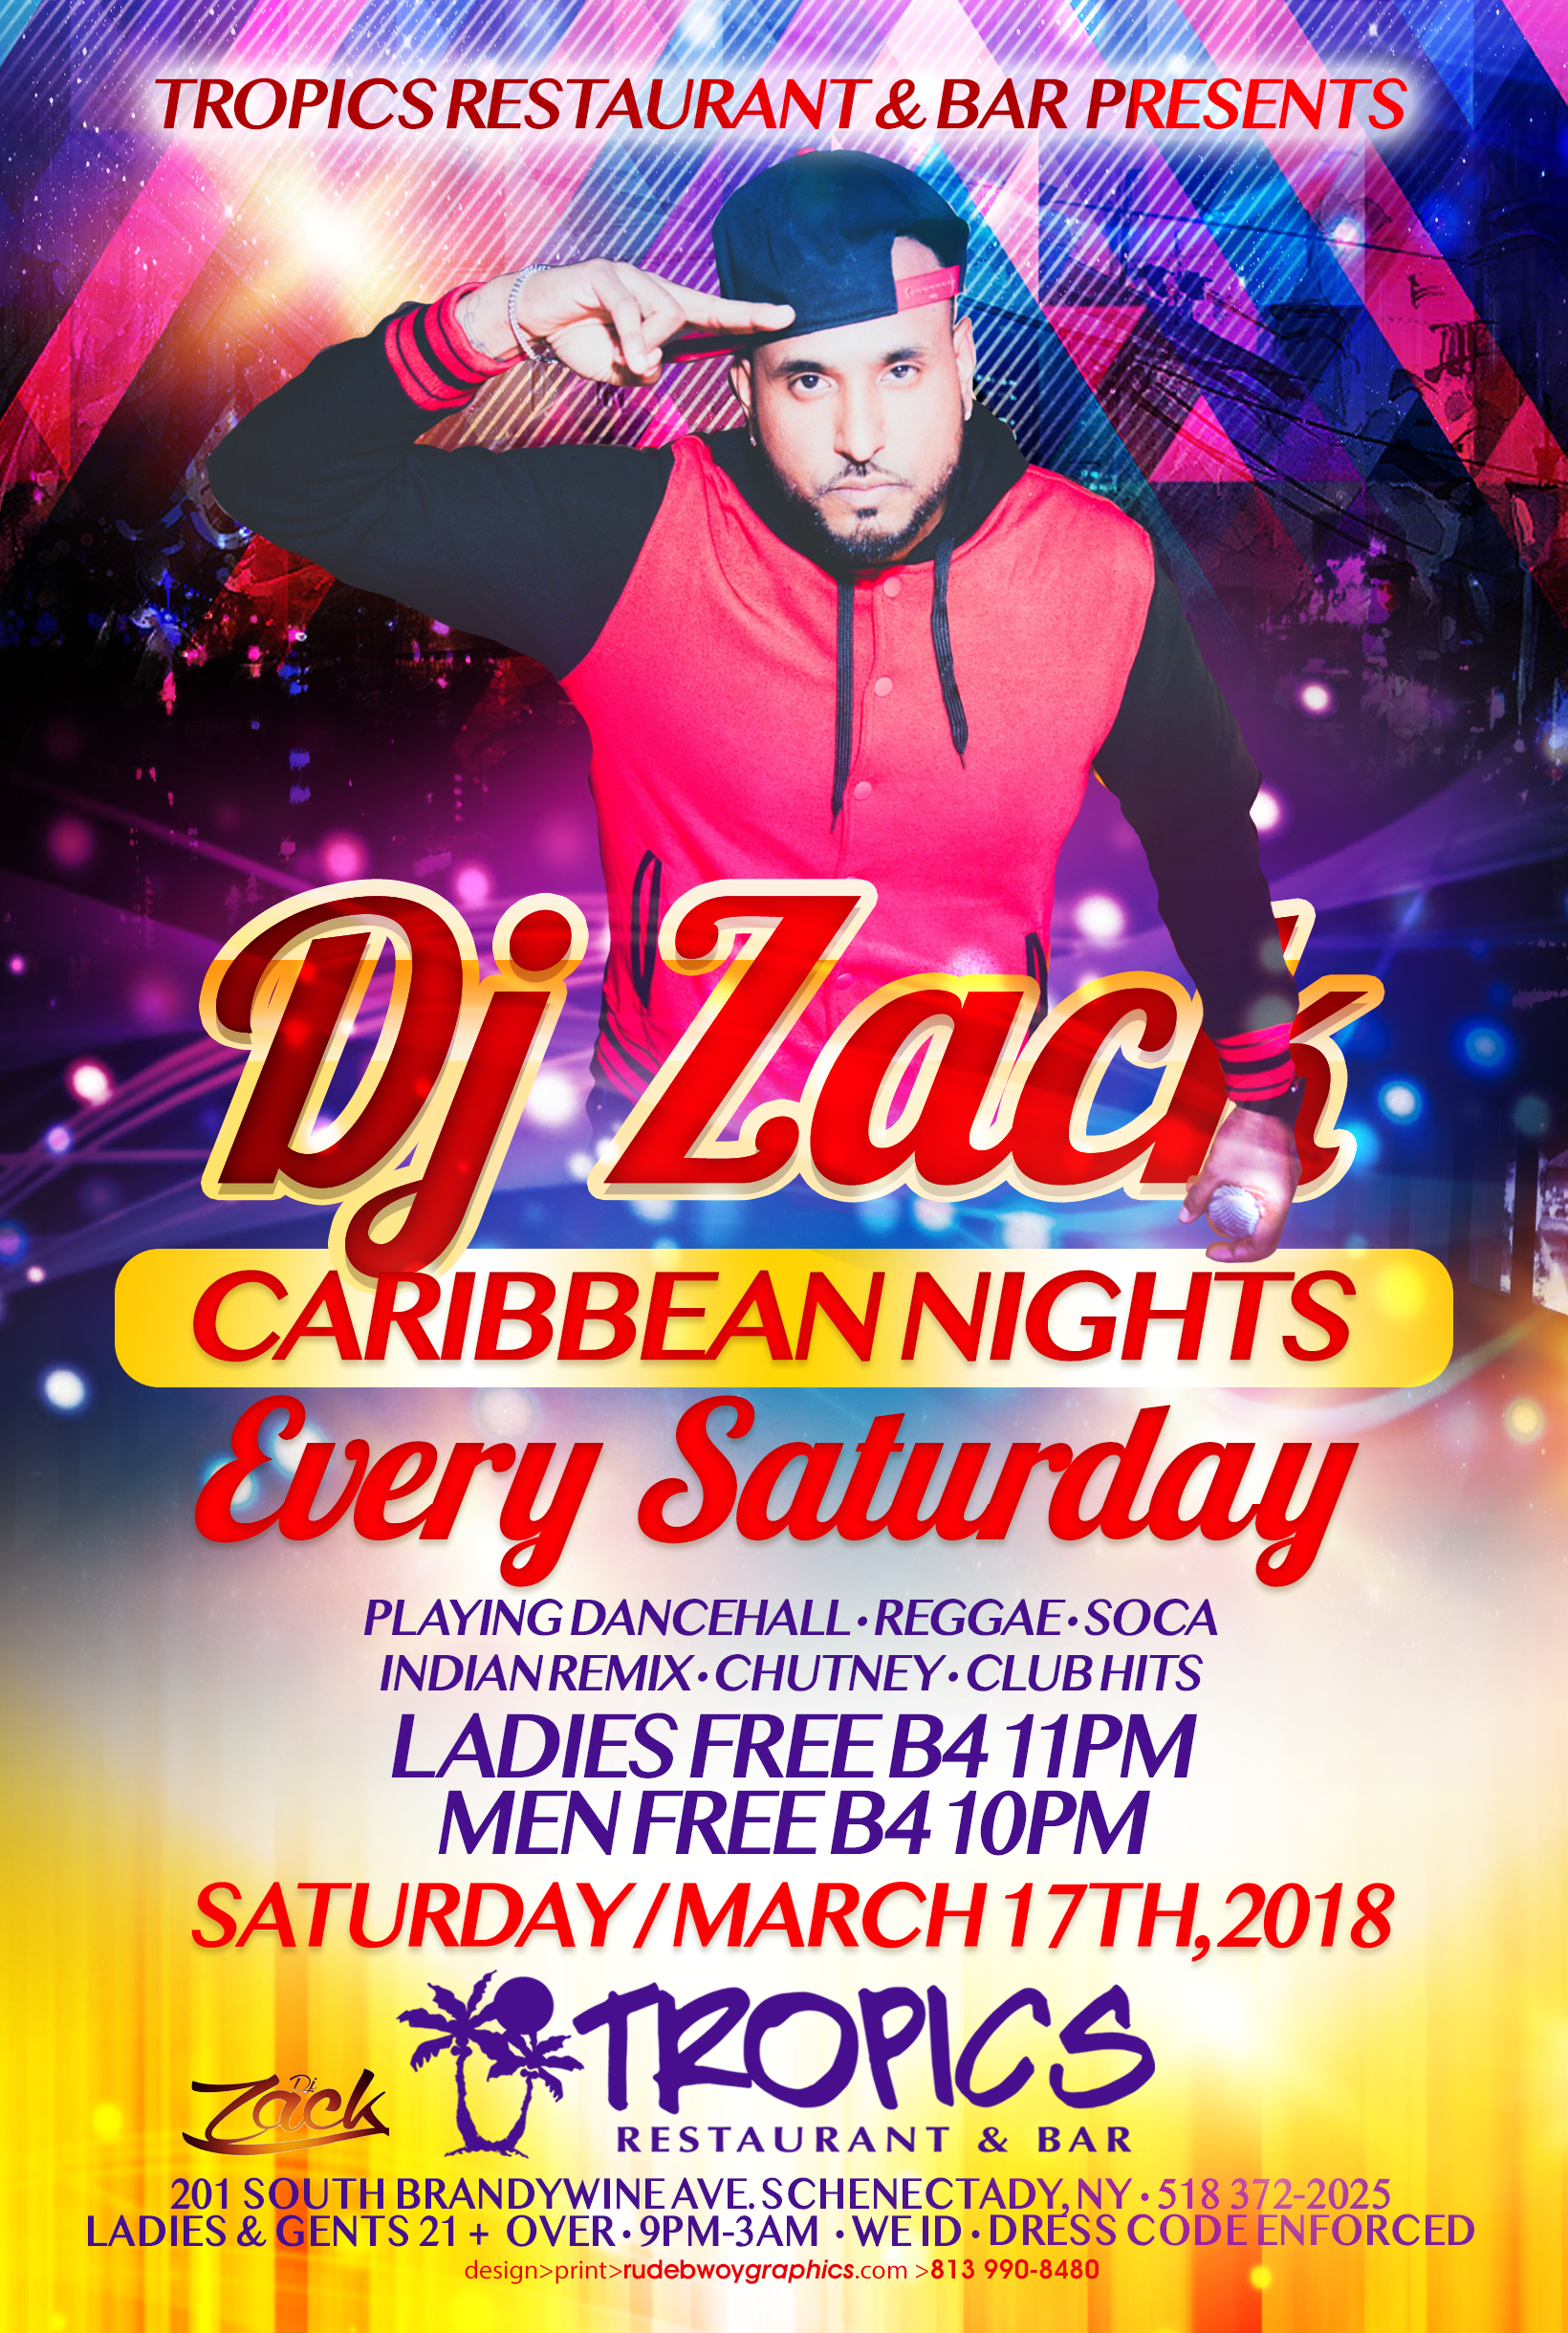 TROPICS DJ ZACK CARIBBEAN NIGHT